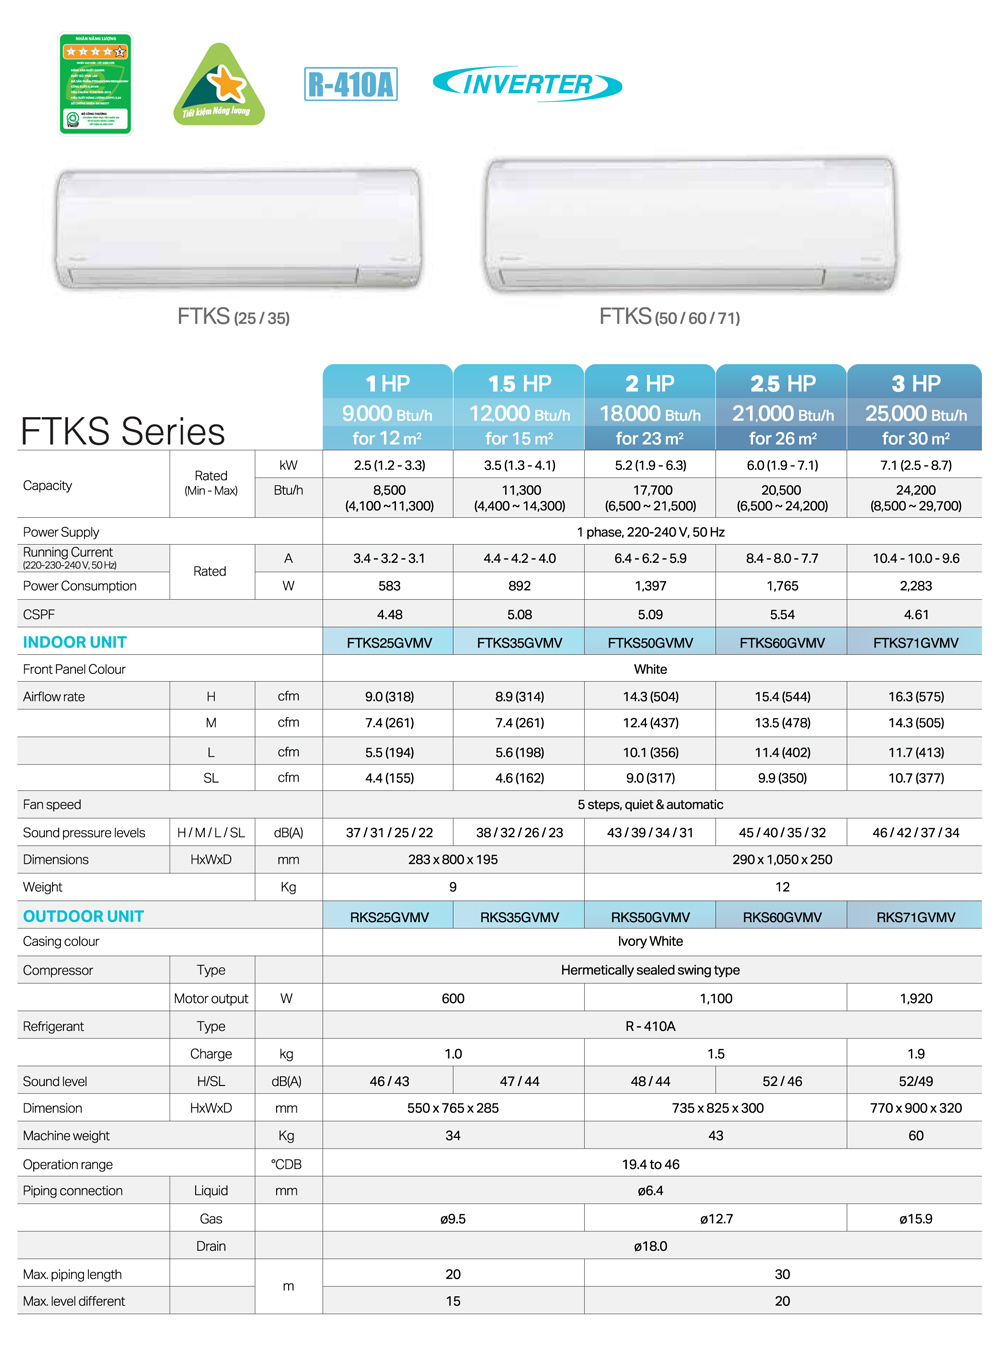 daikin-air-conditioner-inverter-ftks71gvmv-3-0hp-10